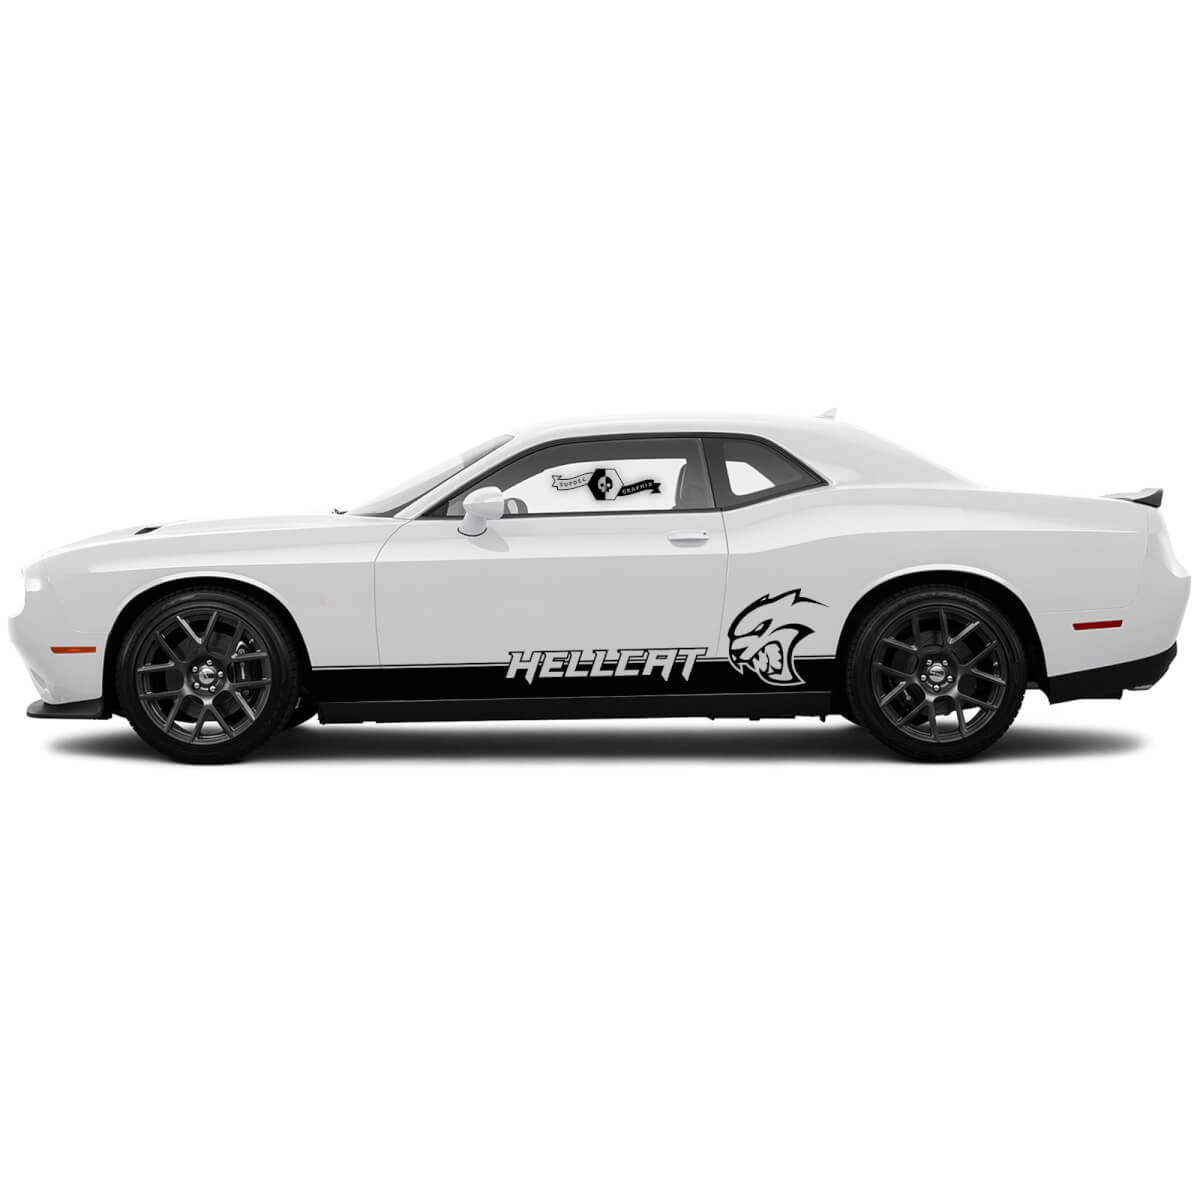 2x New Dodge Challenger SRT Hellcat Rocker Panel Aufkleber Streifen Vinylgrafiken